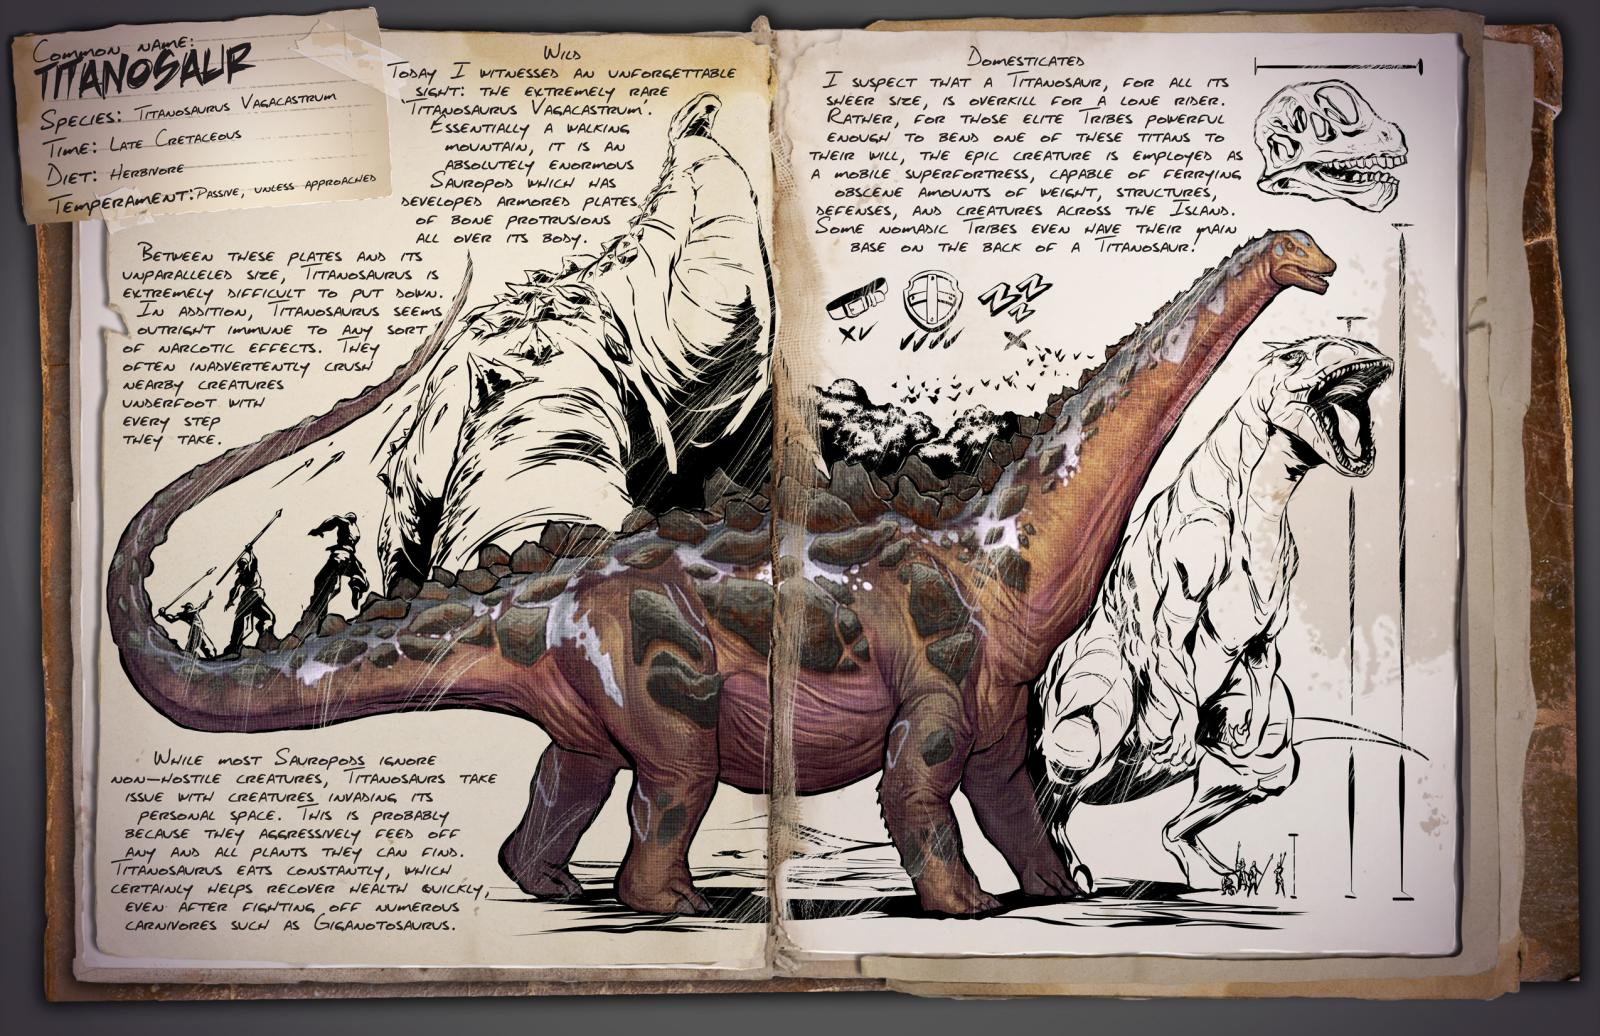 large.Dossier_Titanosaurus.jpg.e47feab21